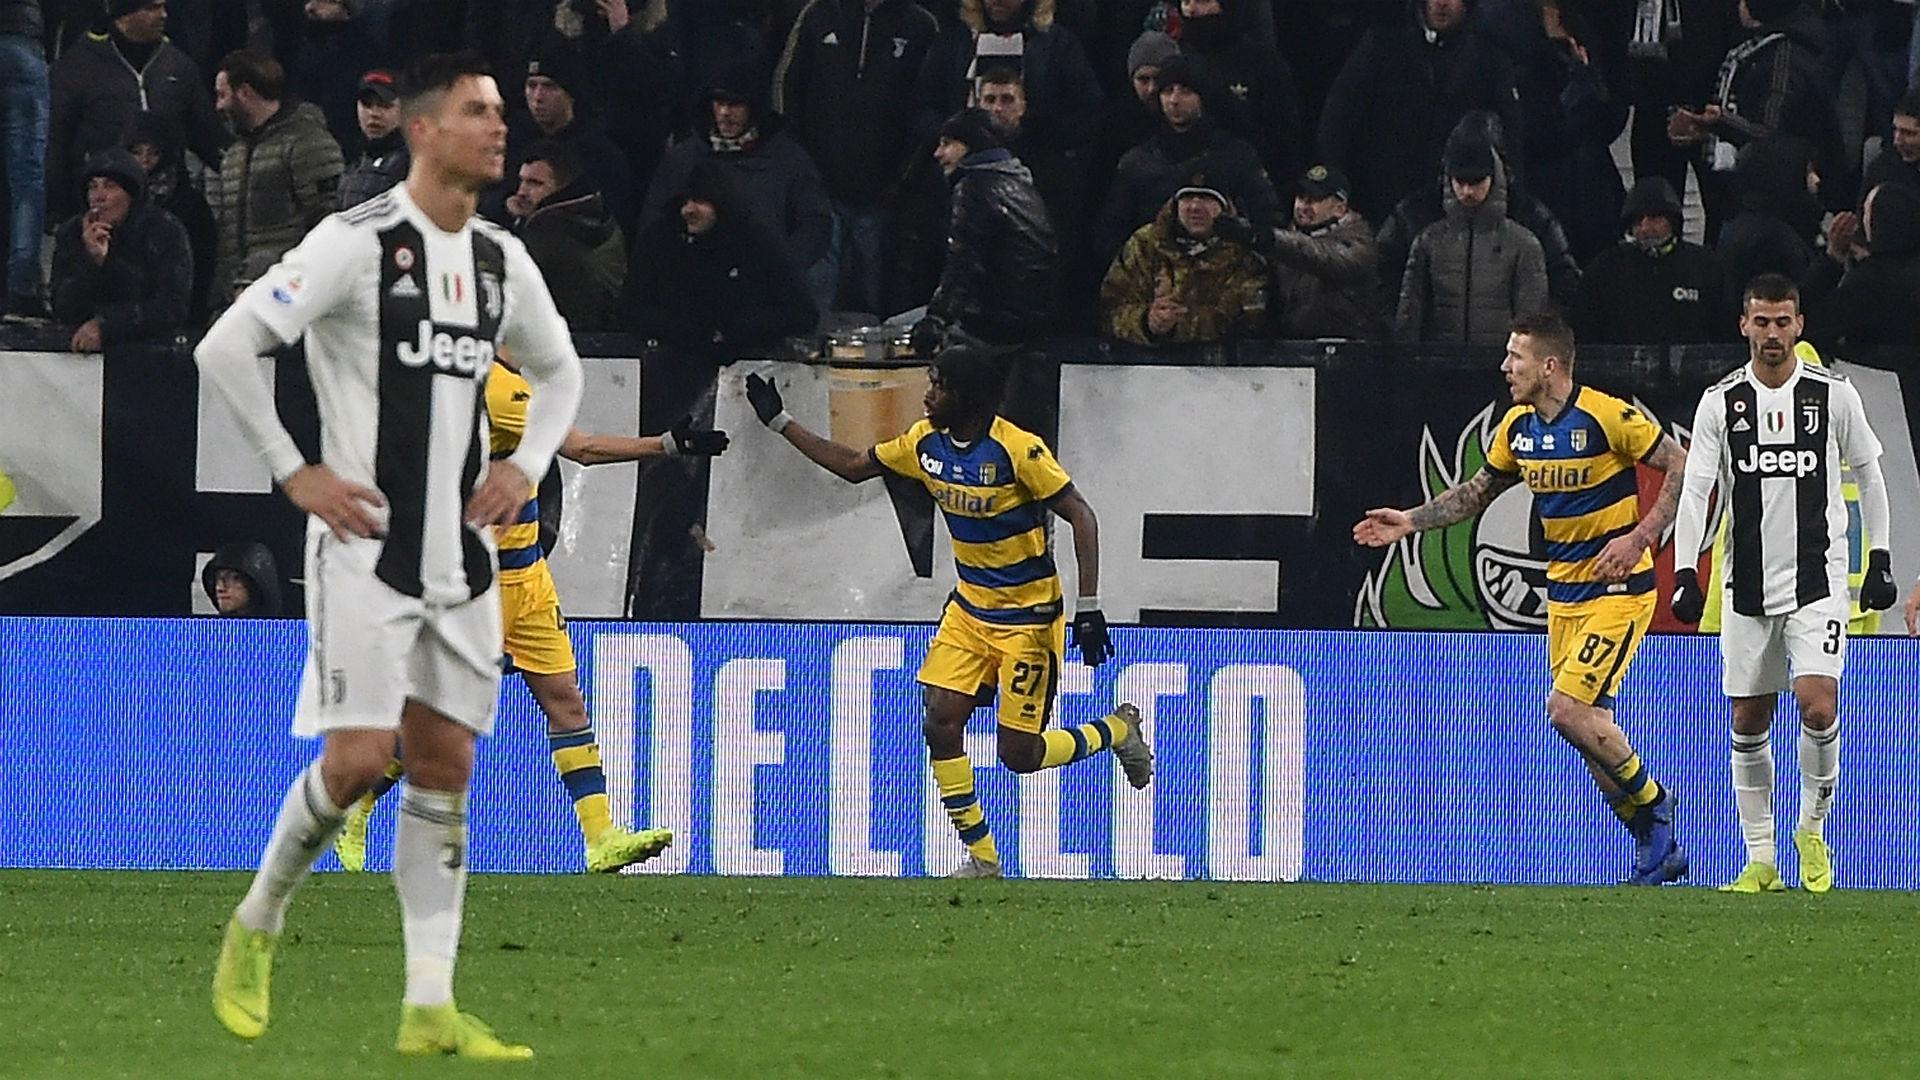 Juventus striker Cristiano Ronaldo urges 'calm' after sudden form slump